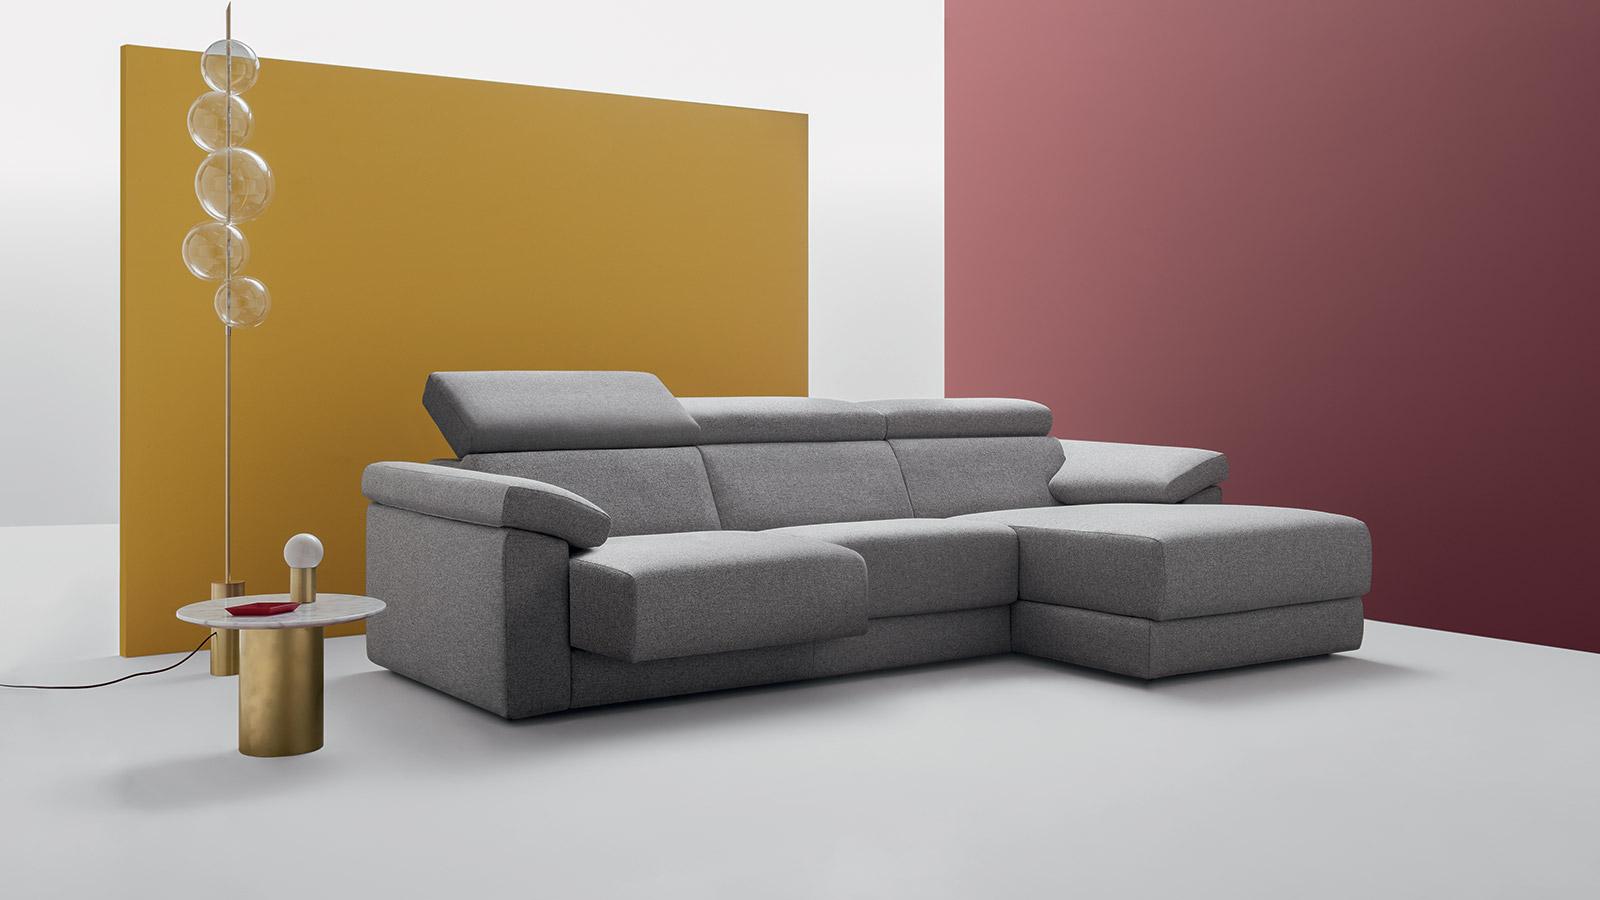 Dexter divani moderni e di design felis